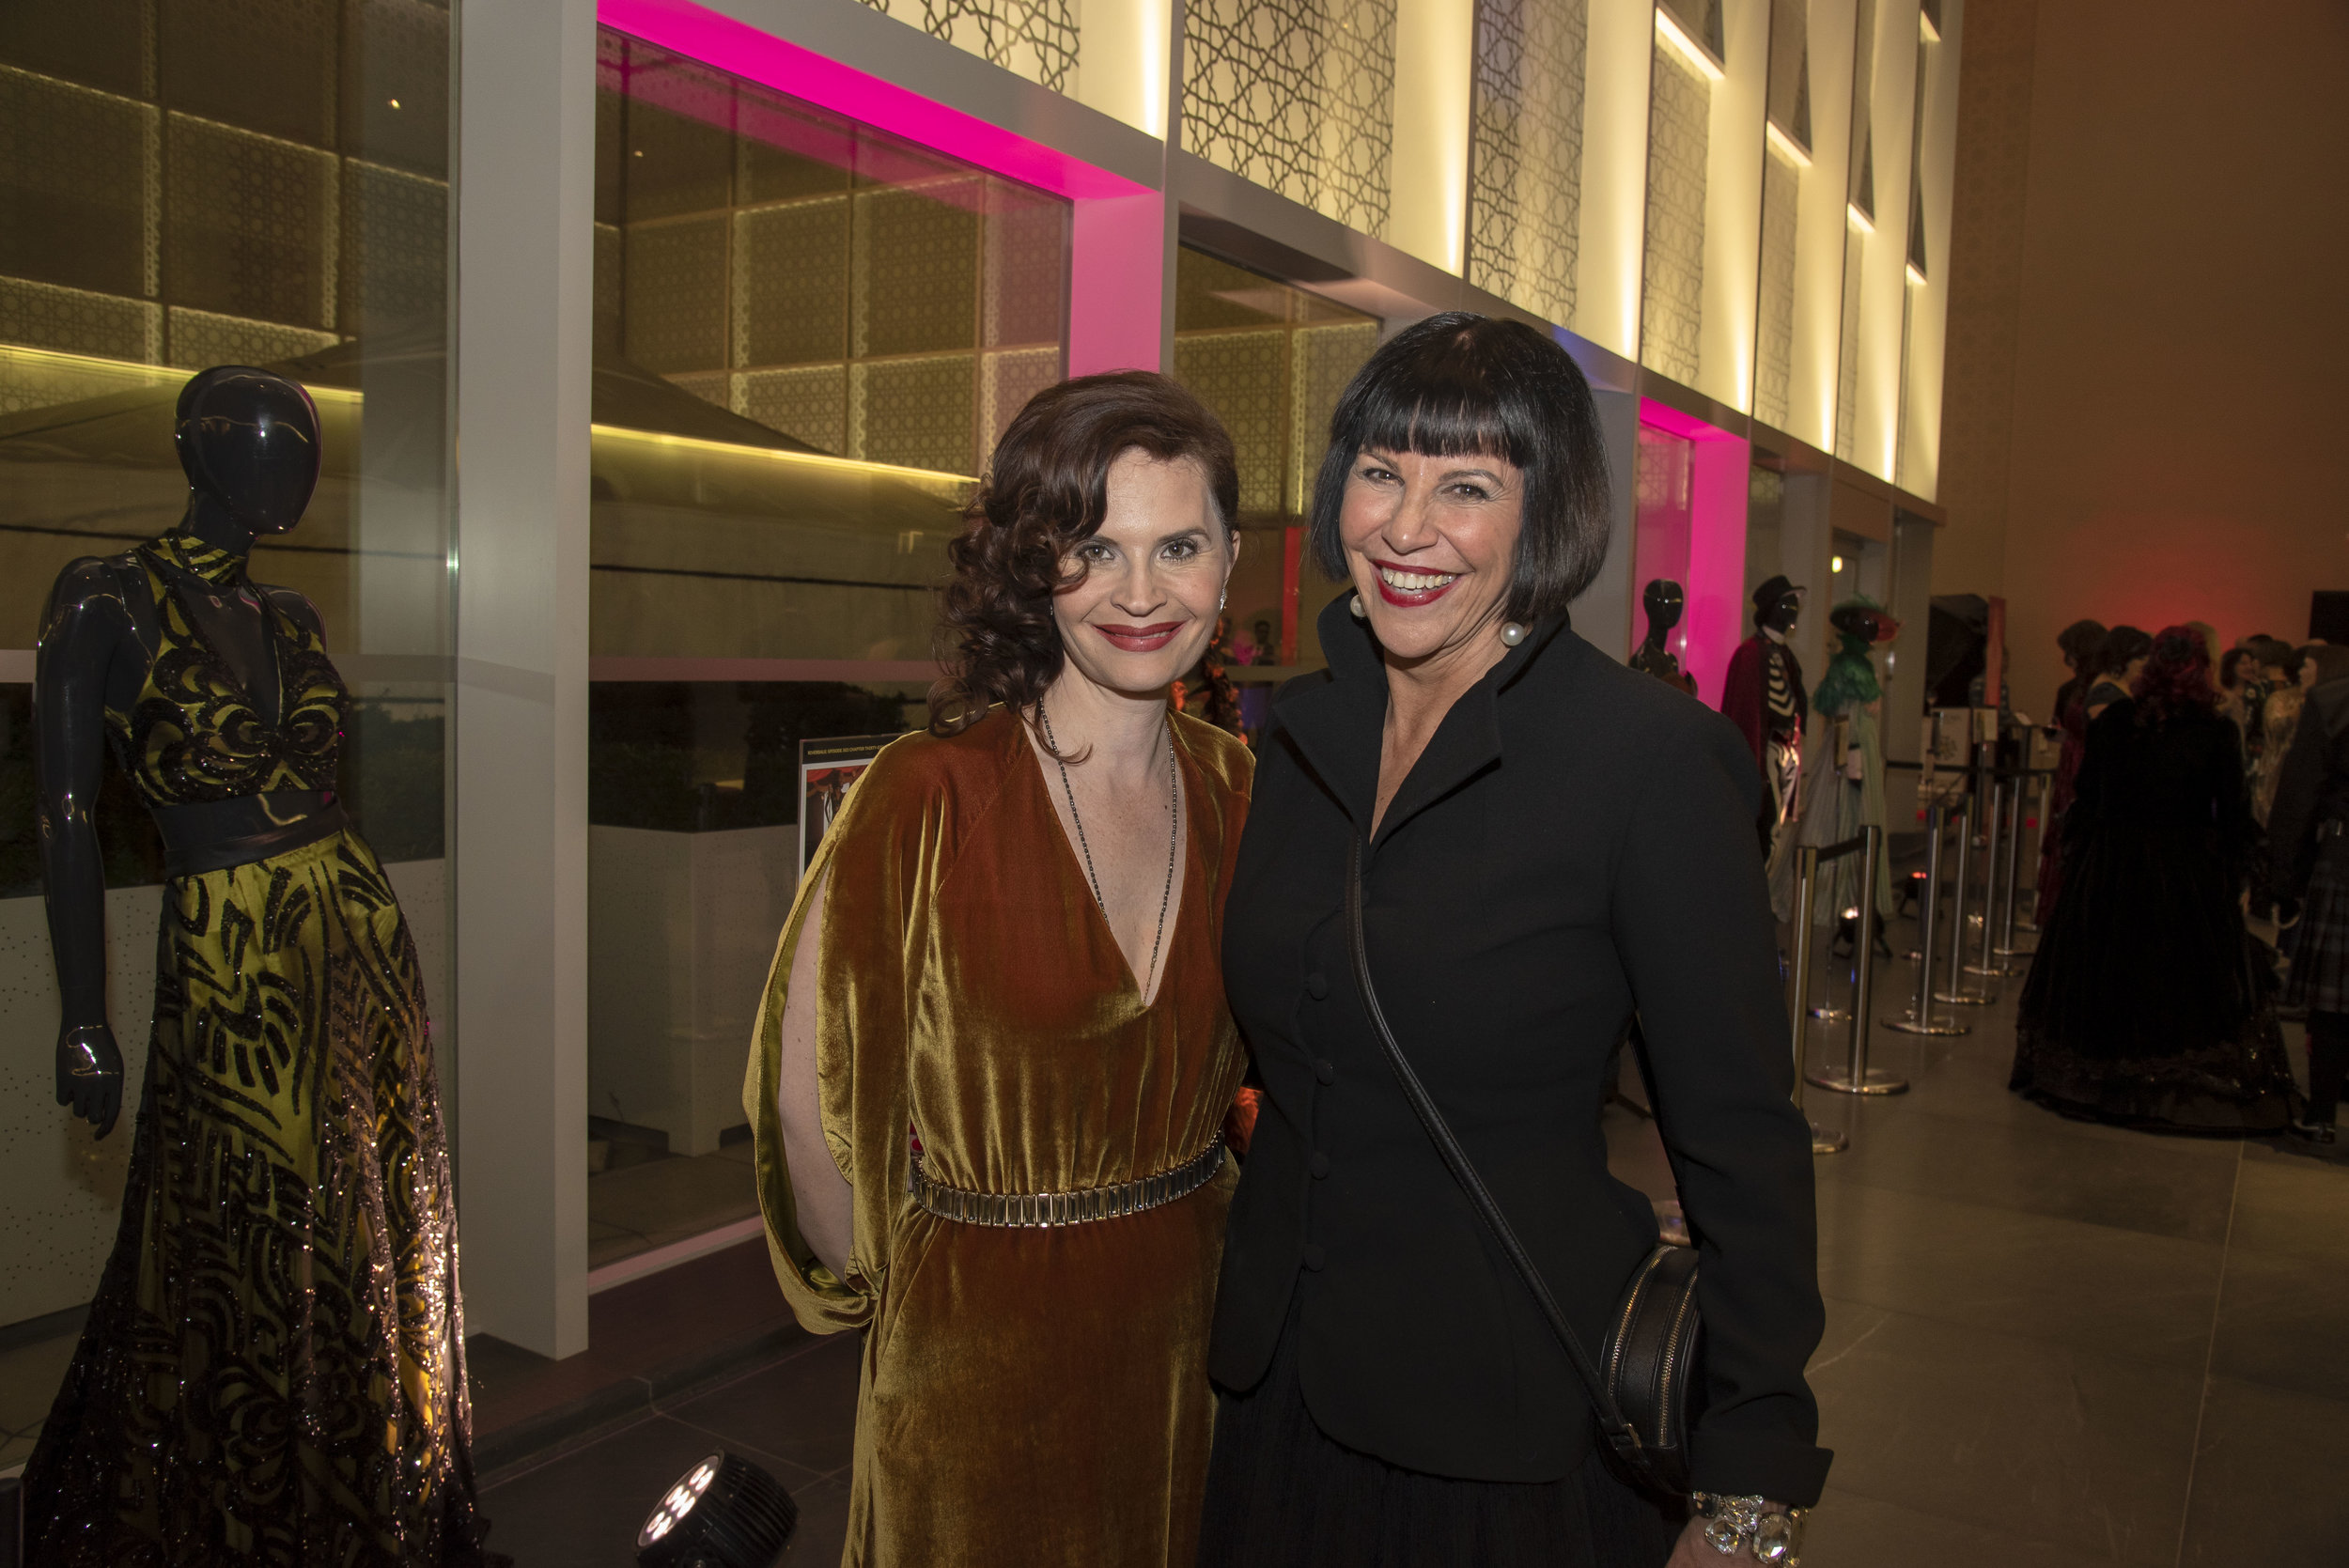 2019 CAFTCAD Awards Co-Chairs Joanna Syrokomla and Cynthia Amsden